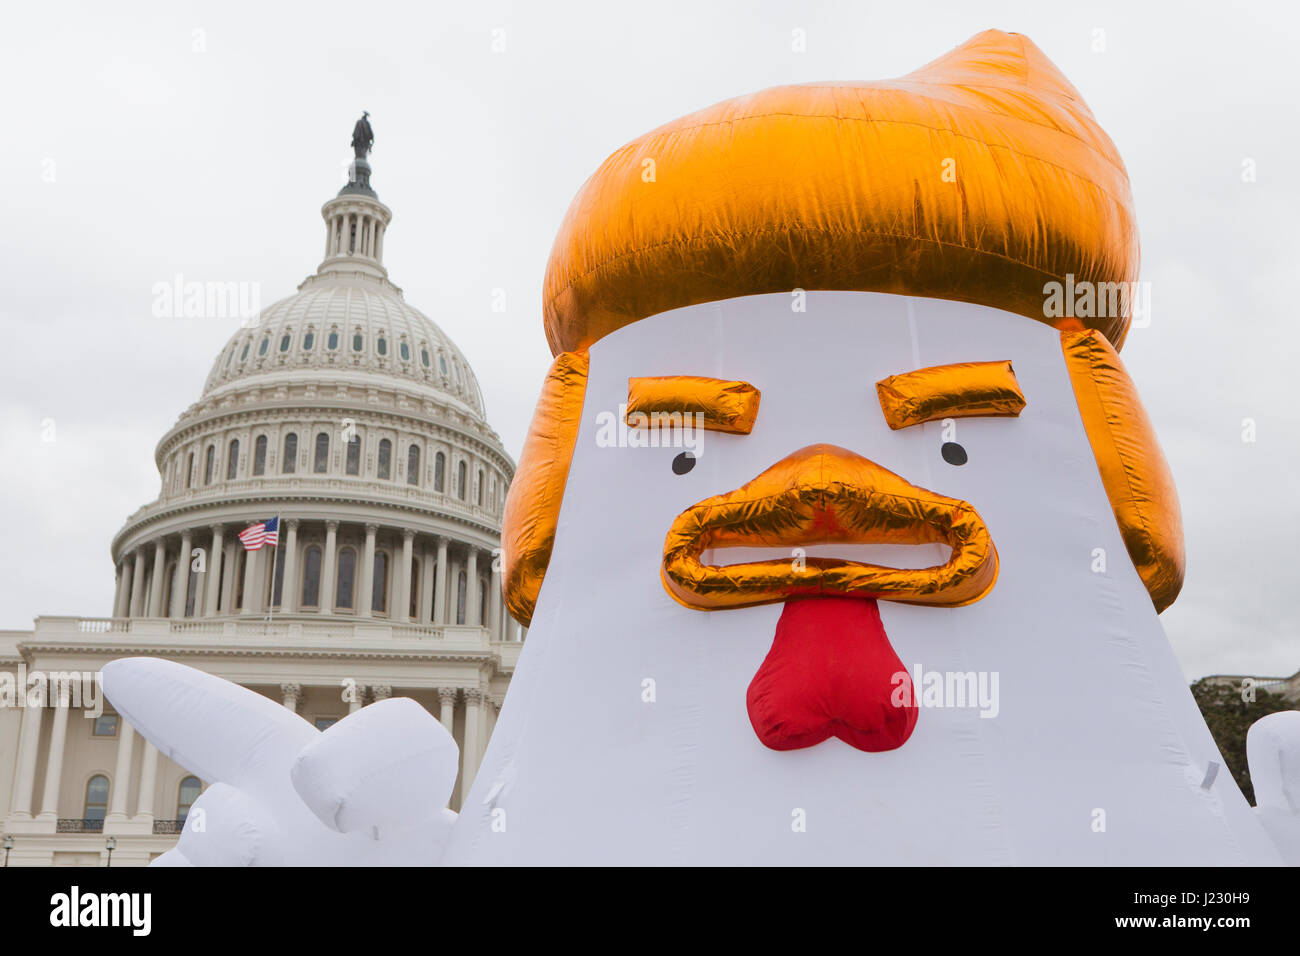 Trump Chicken at protest rally - Washington, DC USA Stock Photo